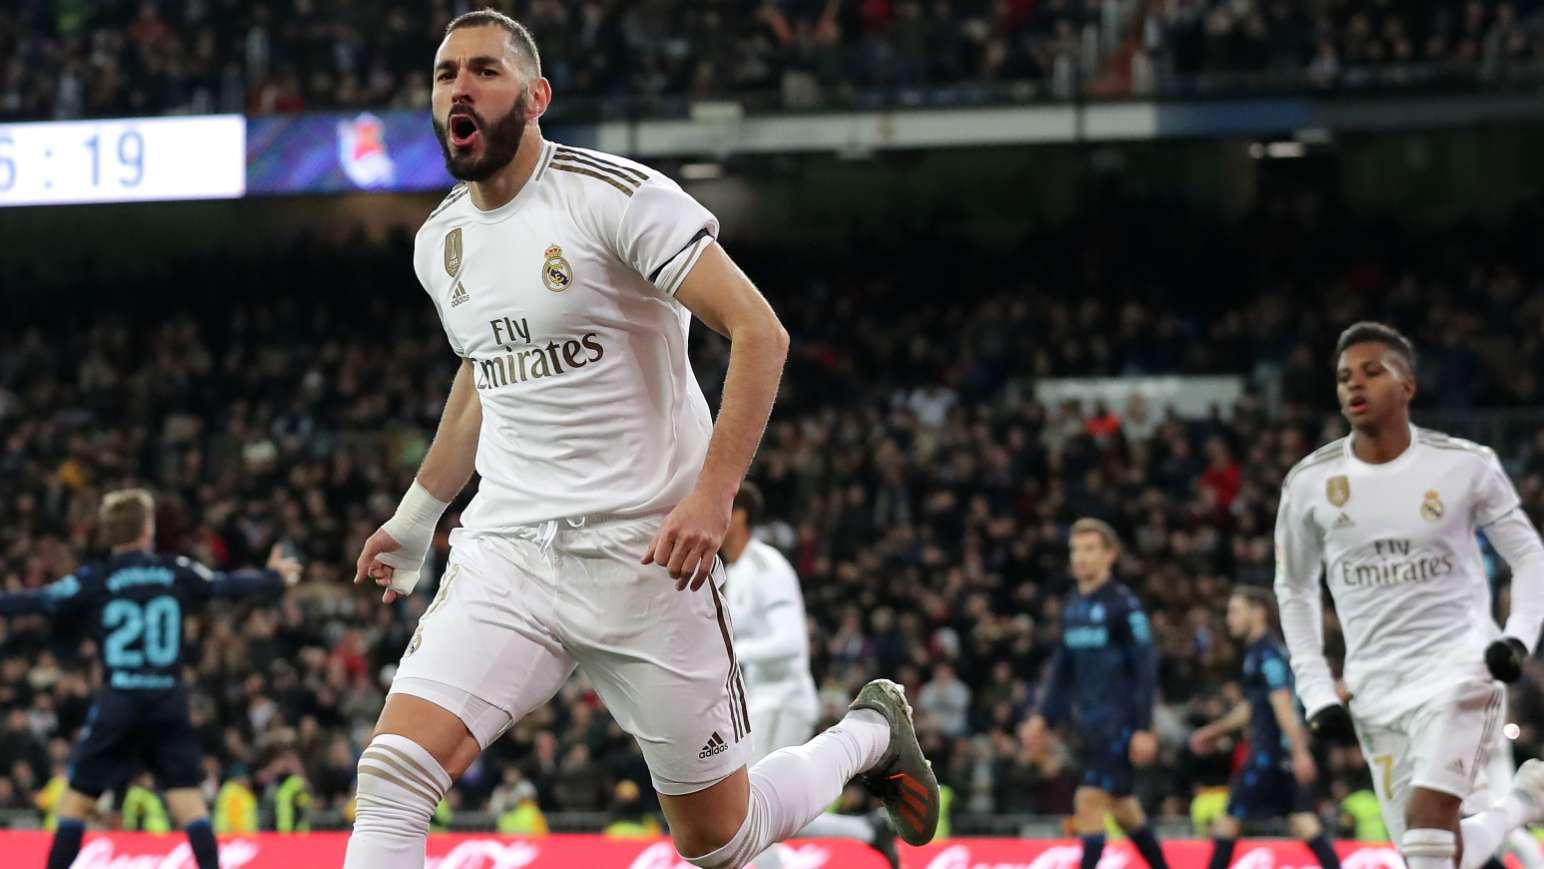 Zidane: Real Madrid do not want revenge on Paris Saint-Germain